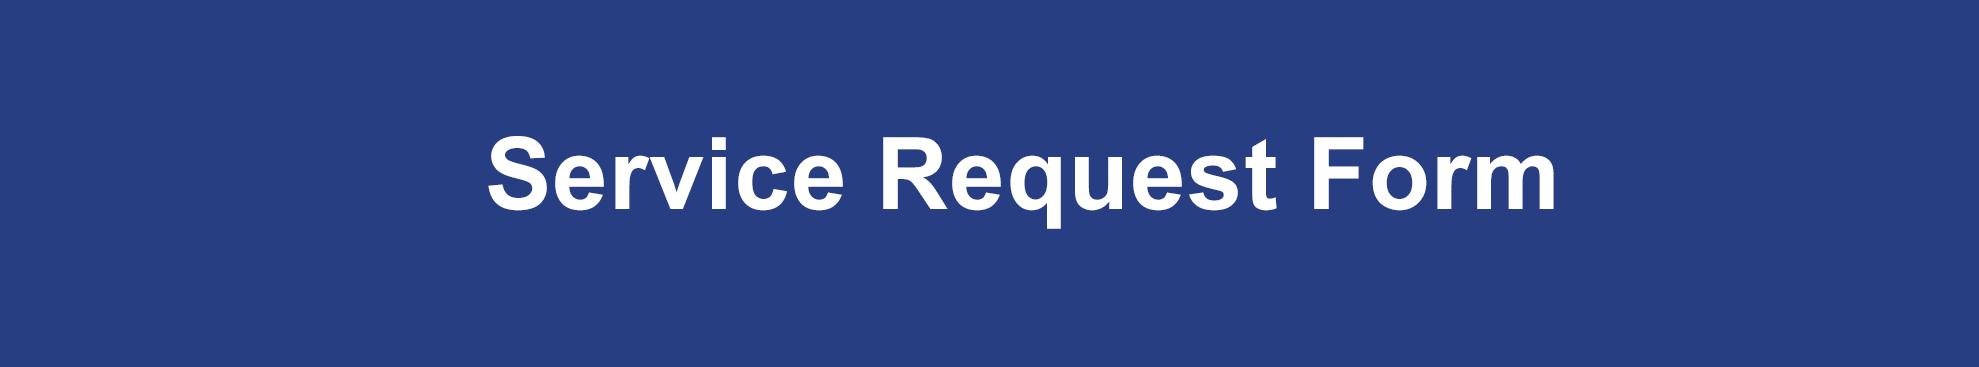 https://northeastheatcool.com.au/wp-content/uploads/2020/06/Service-Request.png